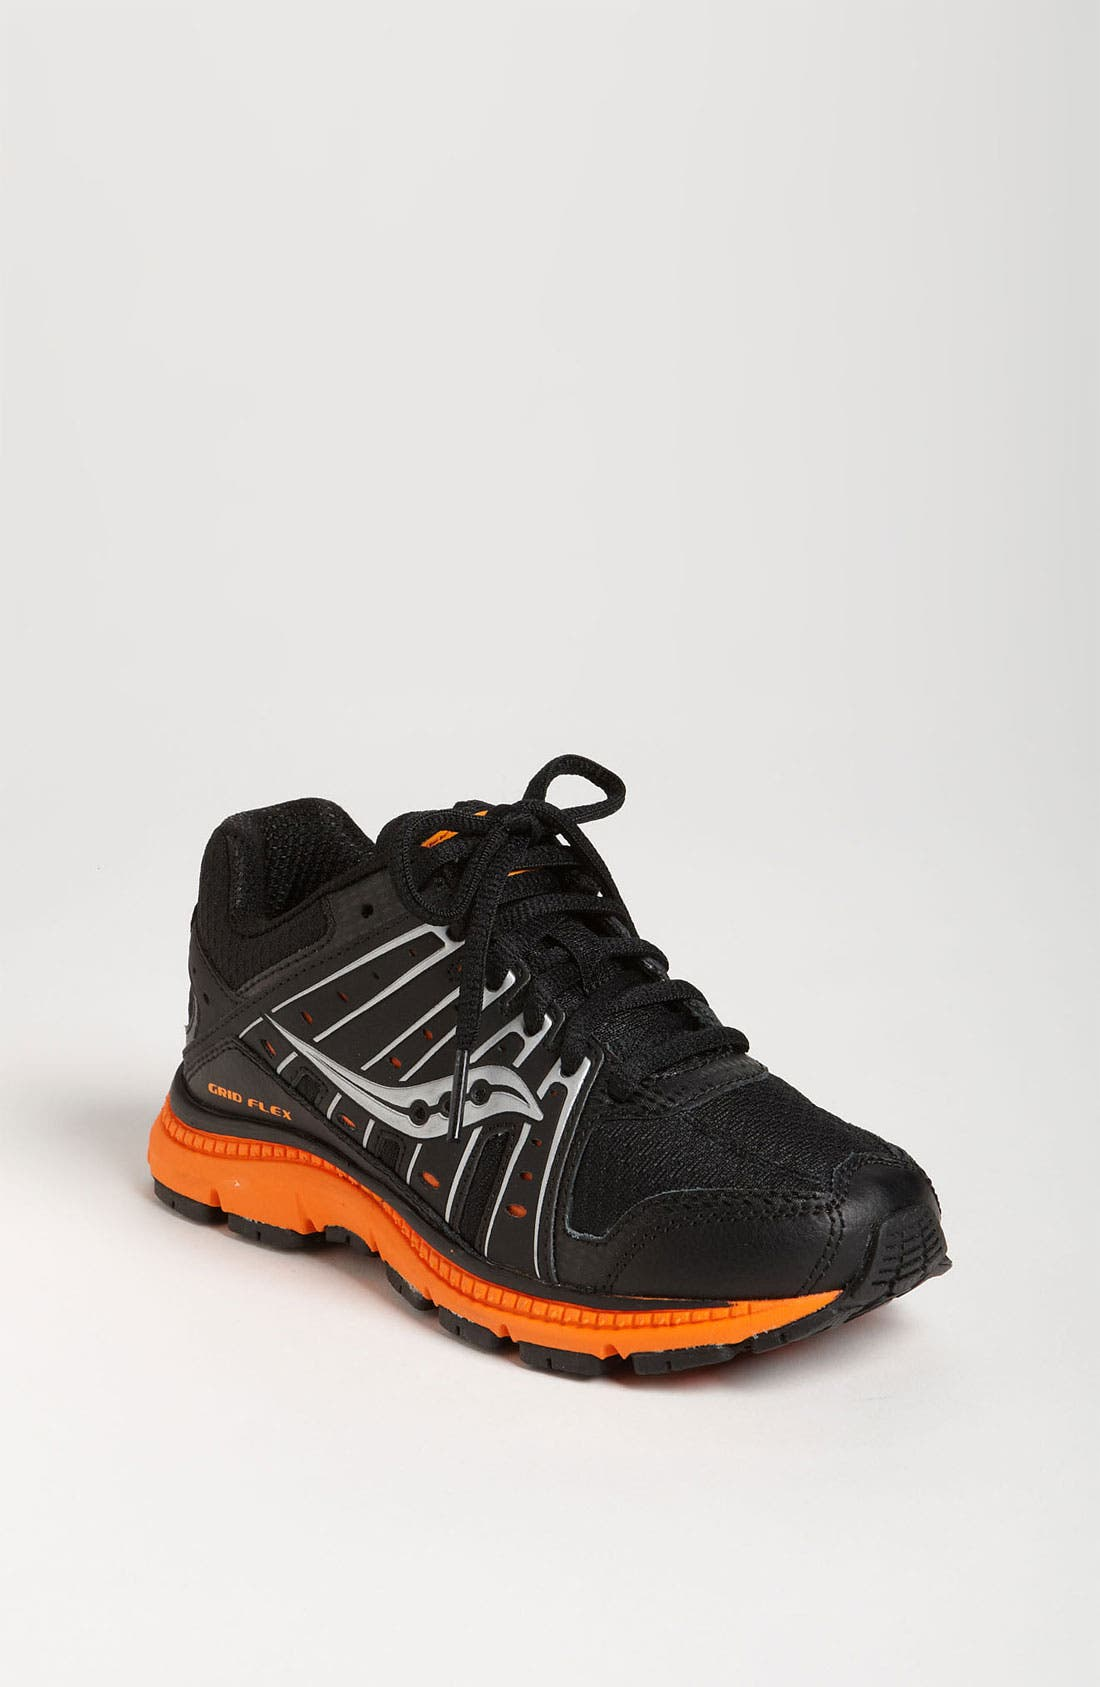 Main Image - Saucony 'Grid Flex' Running Shoe (Toddler, Little Kid & Big Kid)